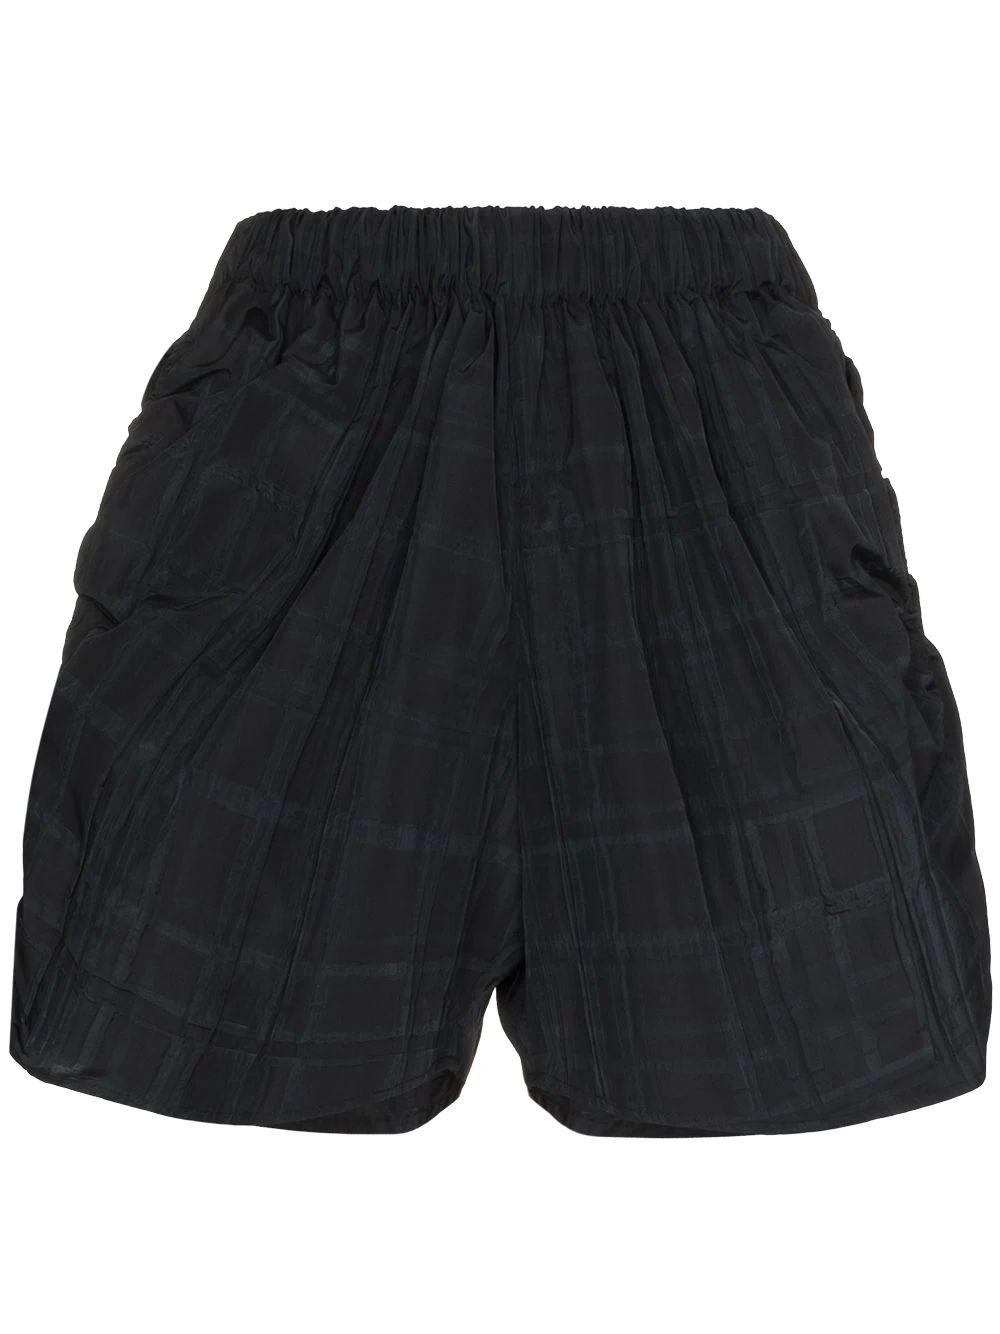 Izzie Recycled Taffeta Shorts